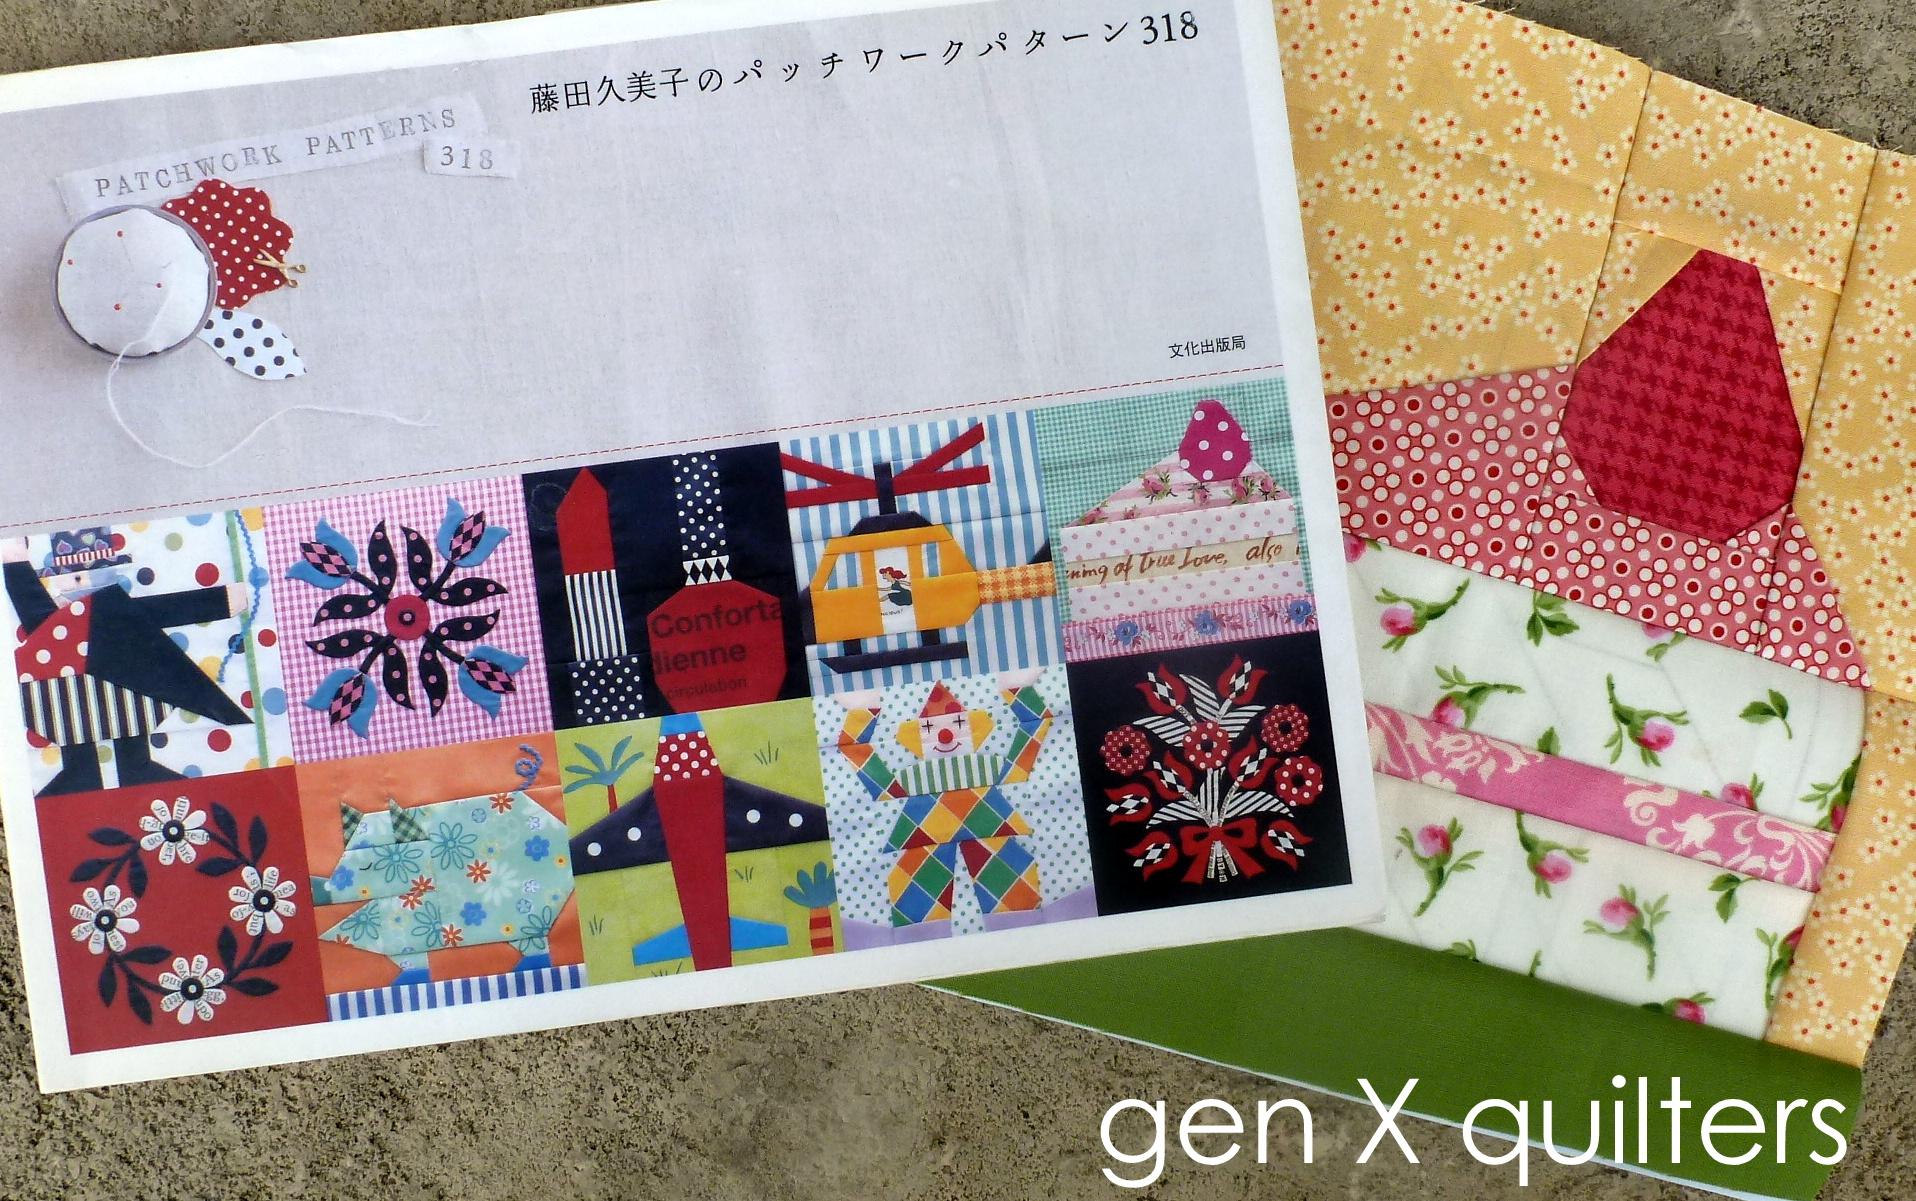 patchwork 318